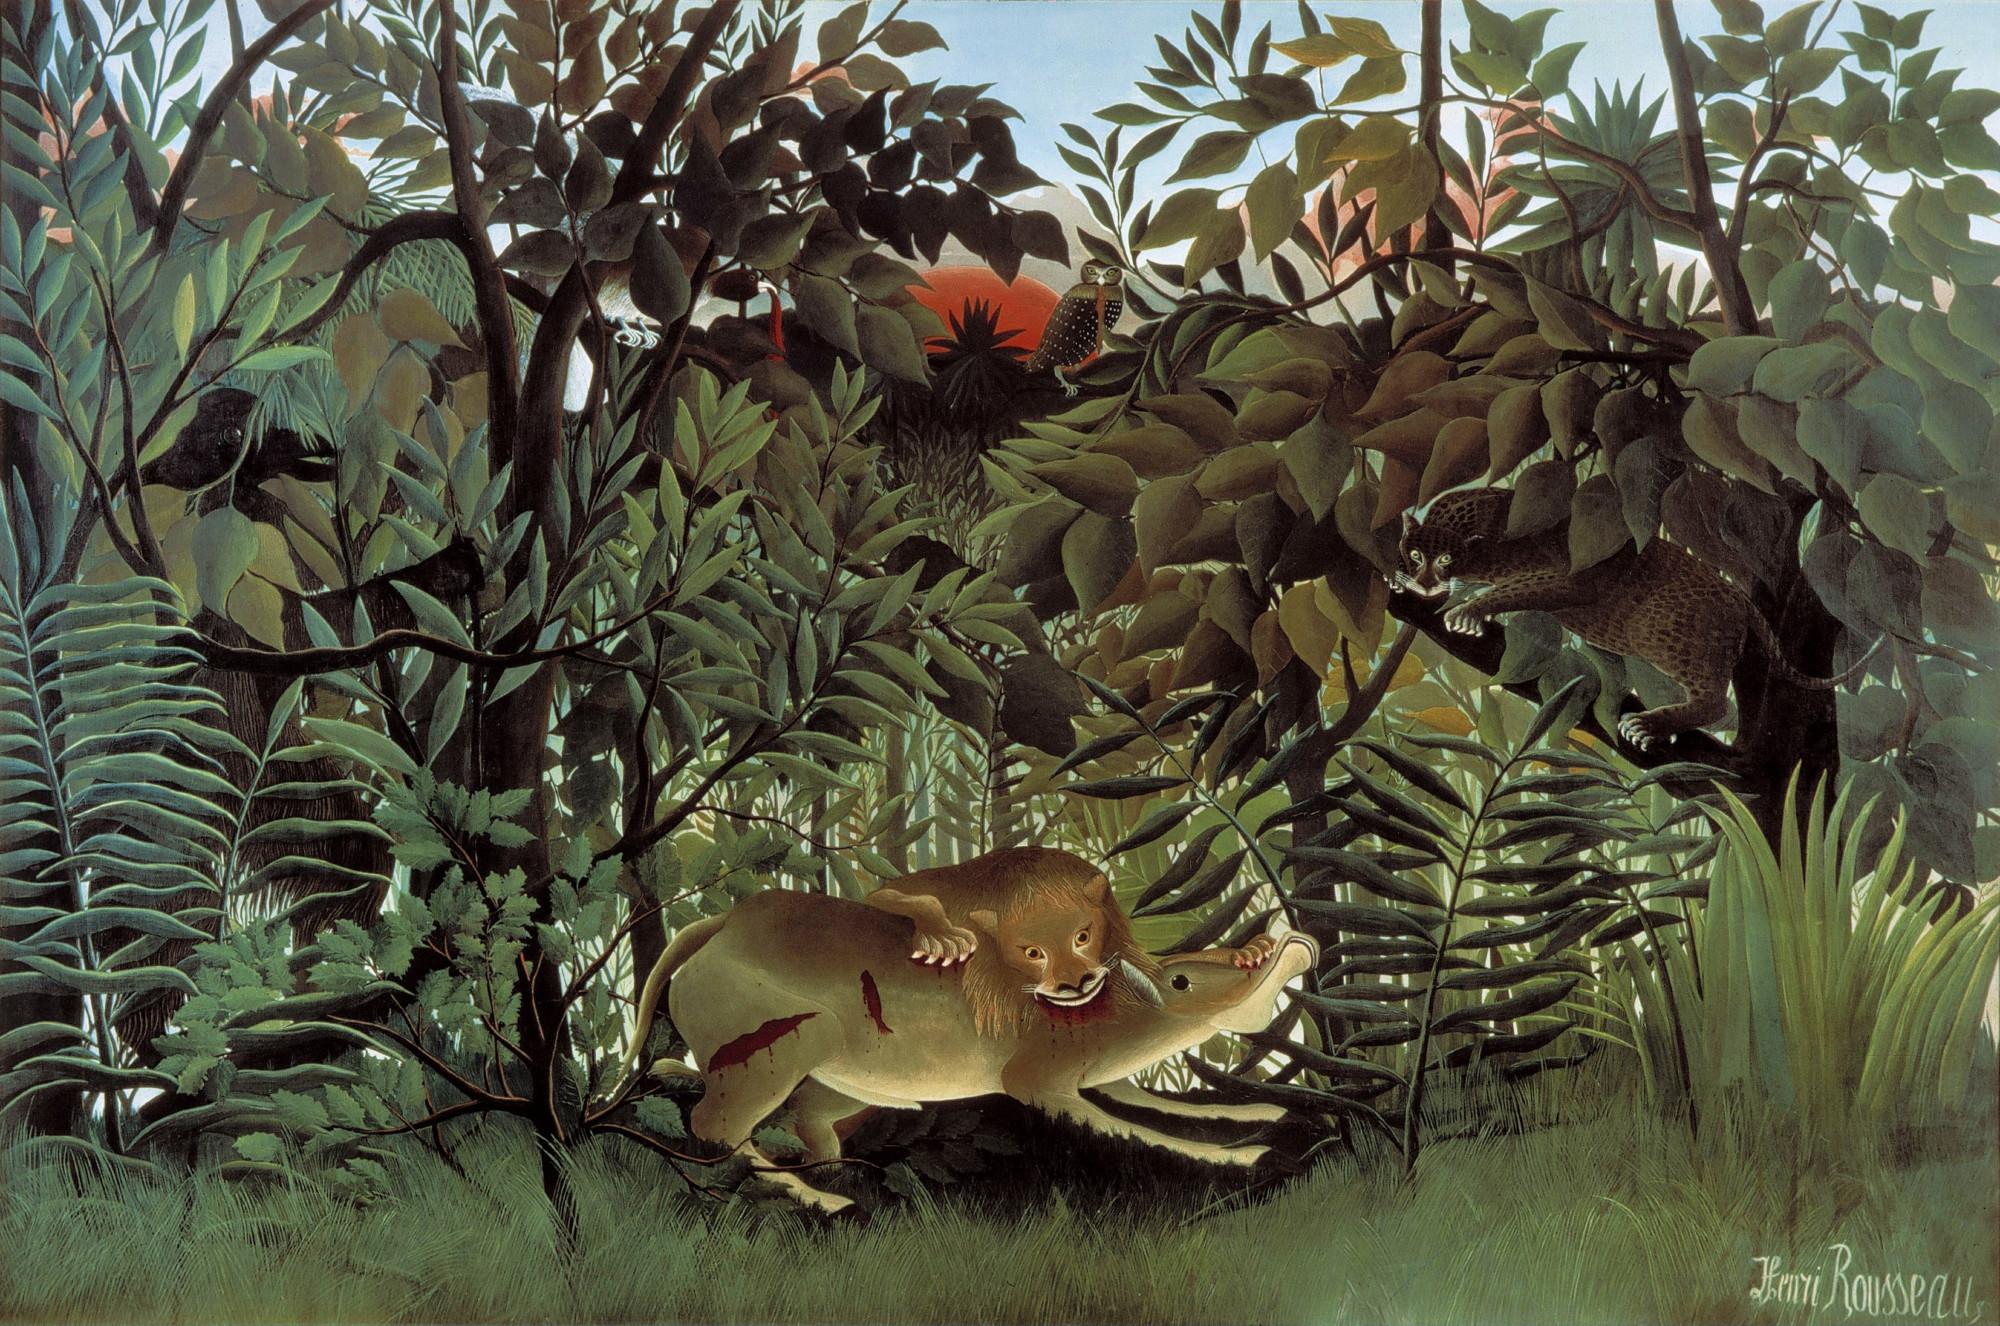 Public domain art of a jungle scene